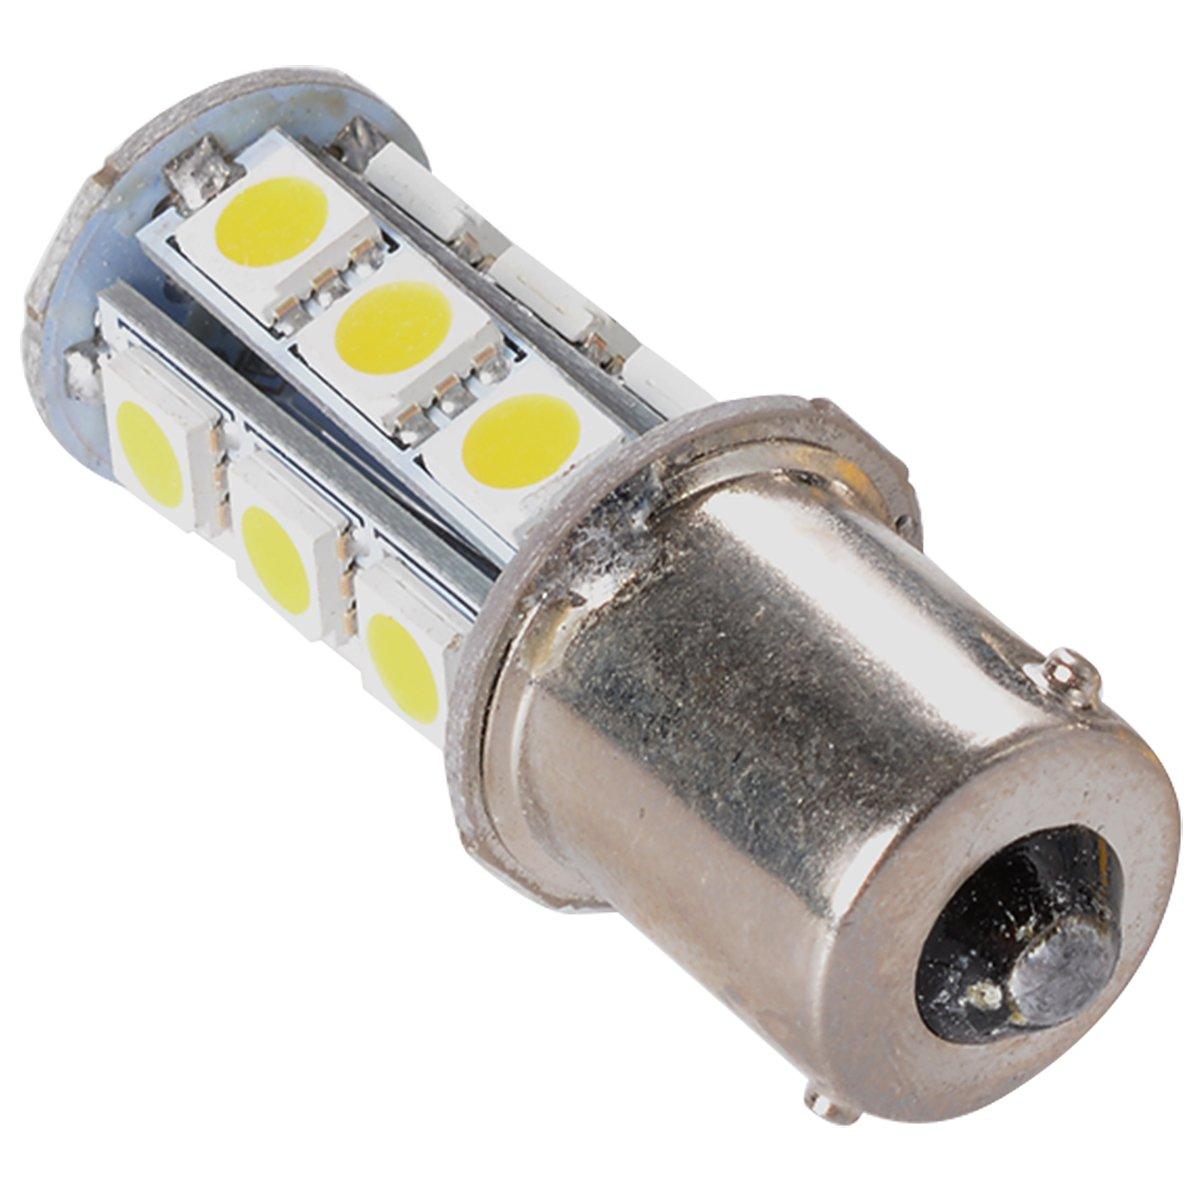 Amazon.com: XCSOURCE 10PCS Warm White 1156 BA15S/1141/1073/1095 Base 18 SMD  5050 LED Replacement Bulb For RV Camper SUV MPV Car Turn Tail Signal Brake  ...